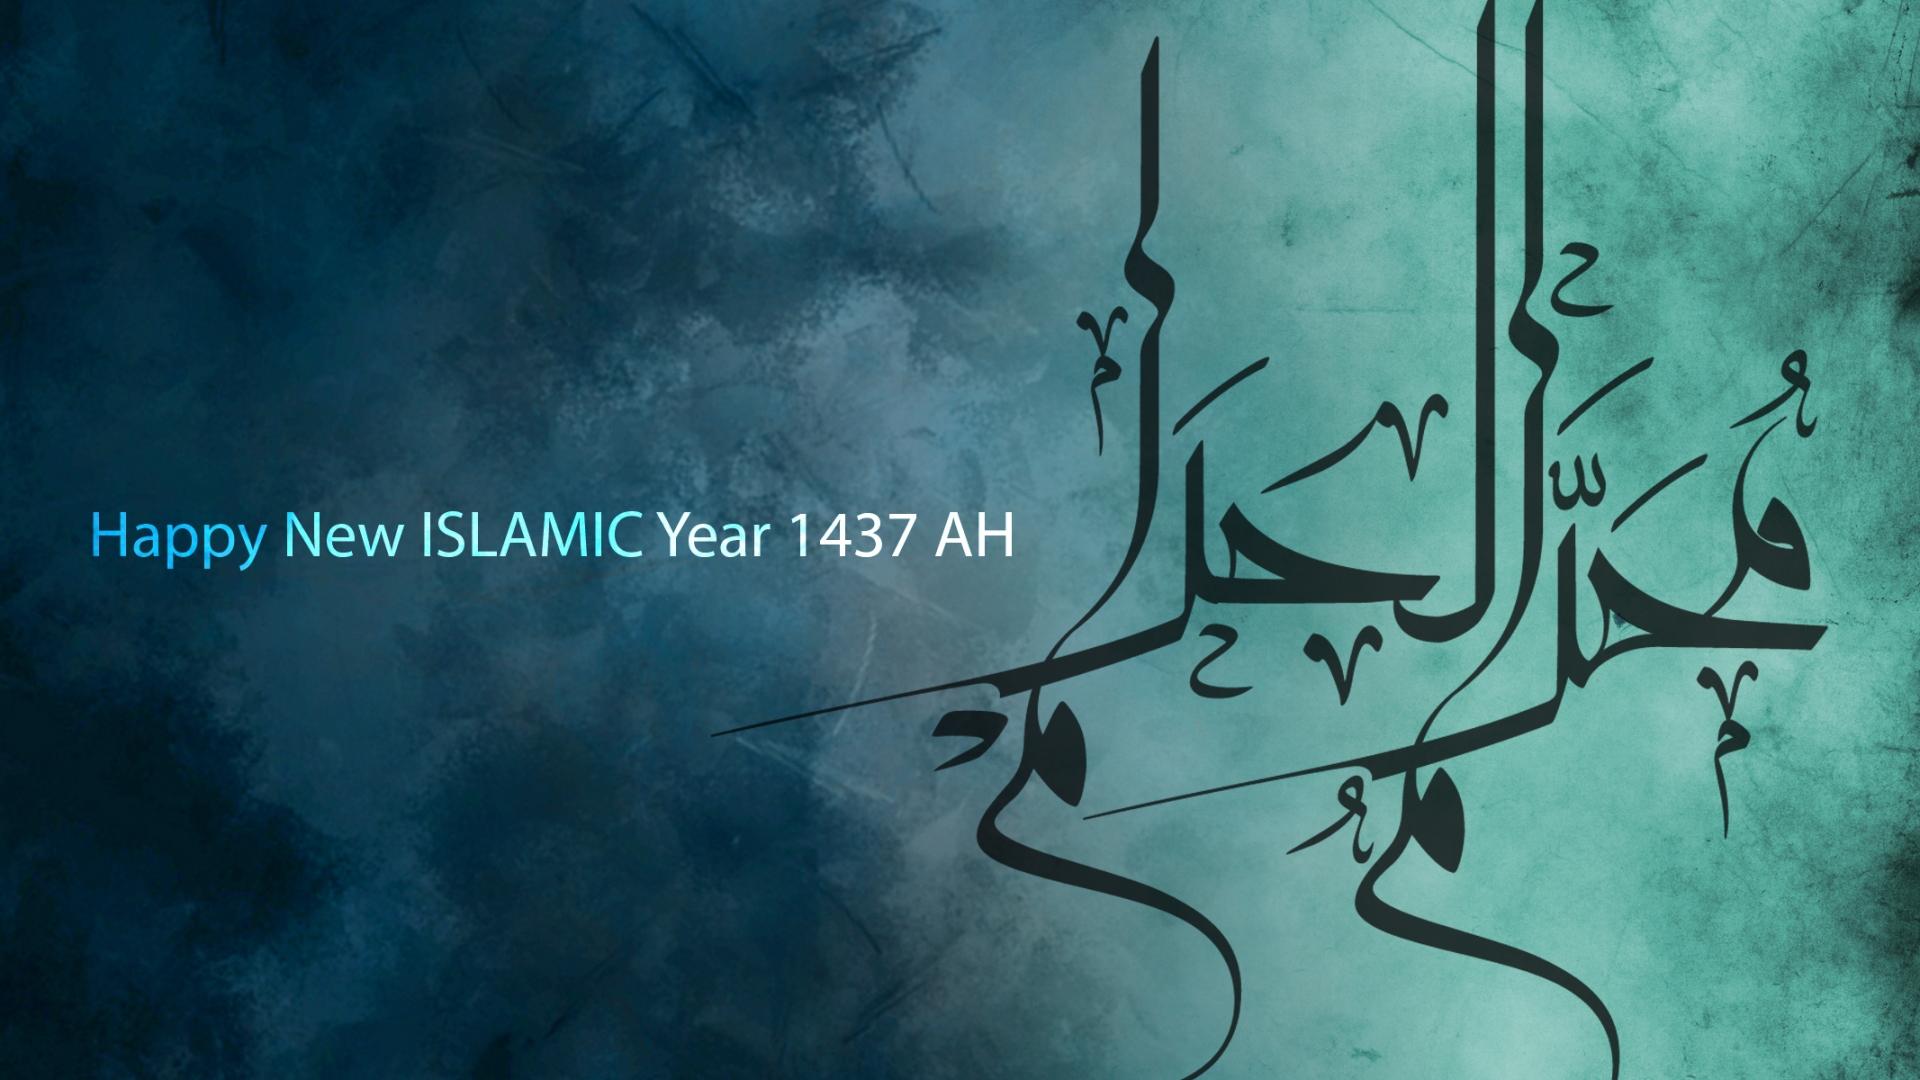 Happy Islamic New Yearmuharram 2017 Date Images 3d 1920x1080 Download Hd Wallpaper Wallpapertip